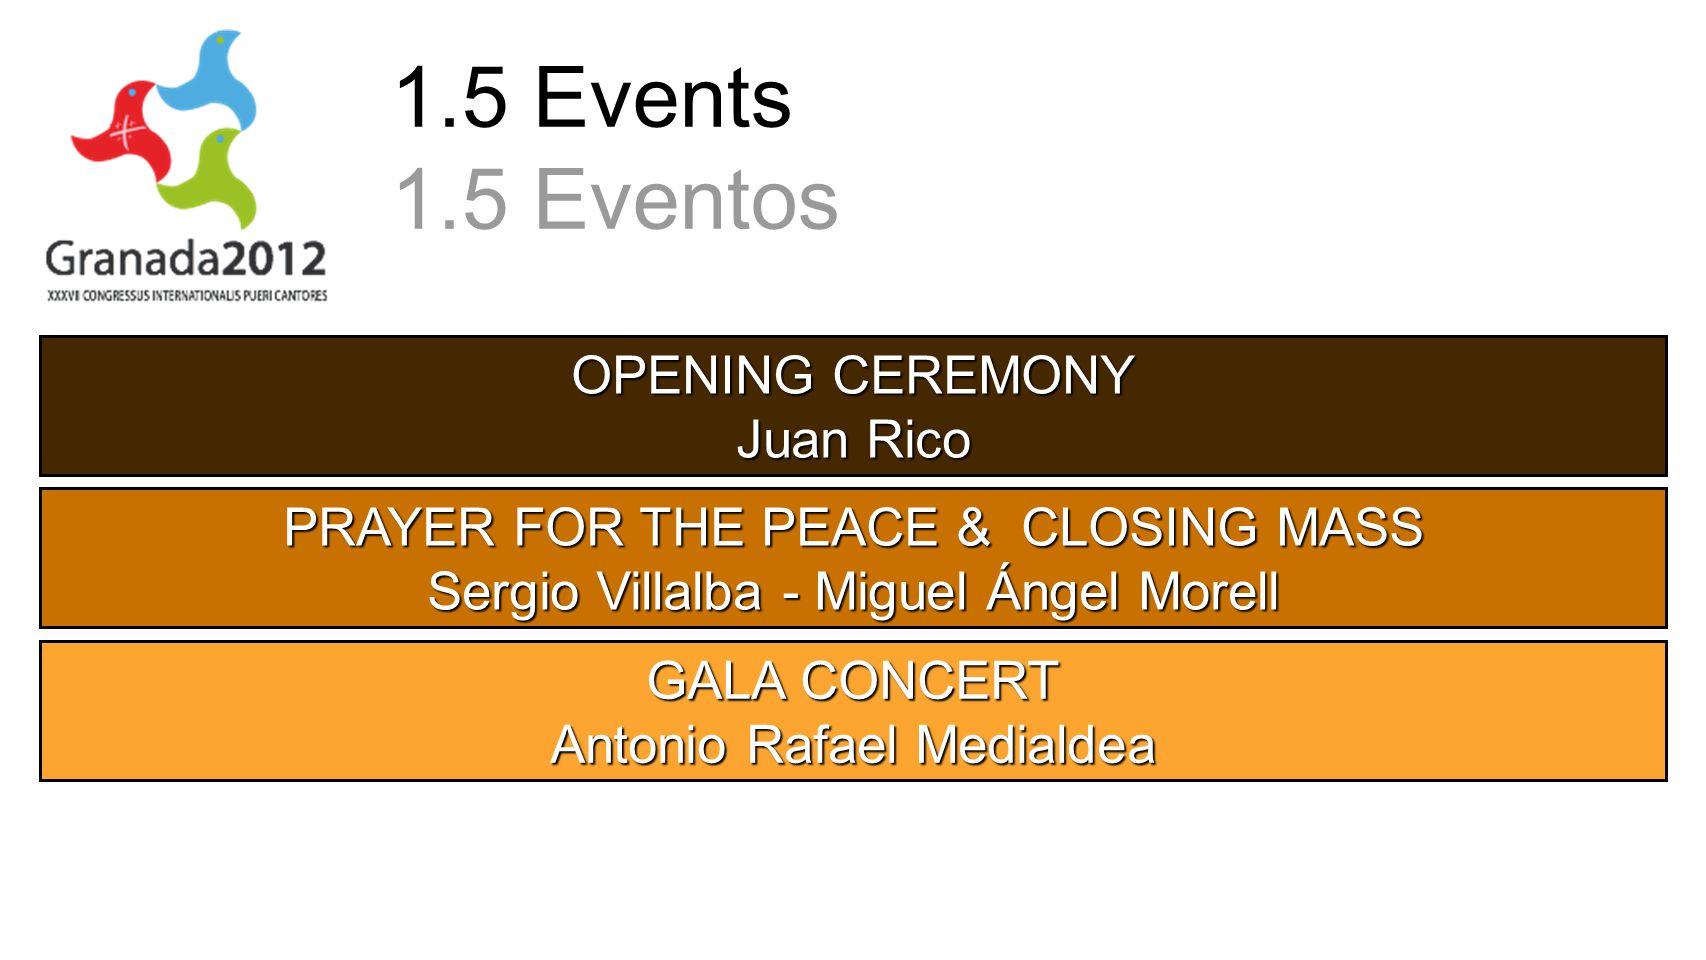 1.5 Events 1.5 Eventos OPENING CEREMONY Juan Rico PRAYER FOR THE PEACE & CLOSING MASS Sergio Villalba - Miguel Ángel Morell GALA CONCERT Antonio Rafael Medialdea